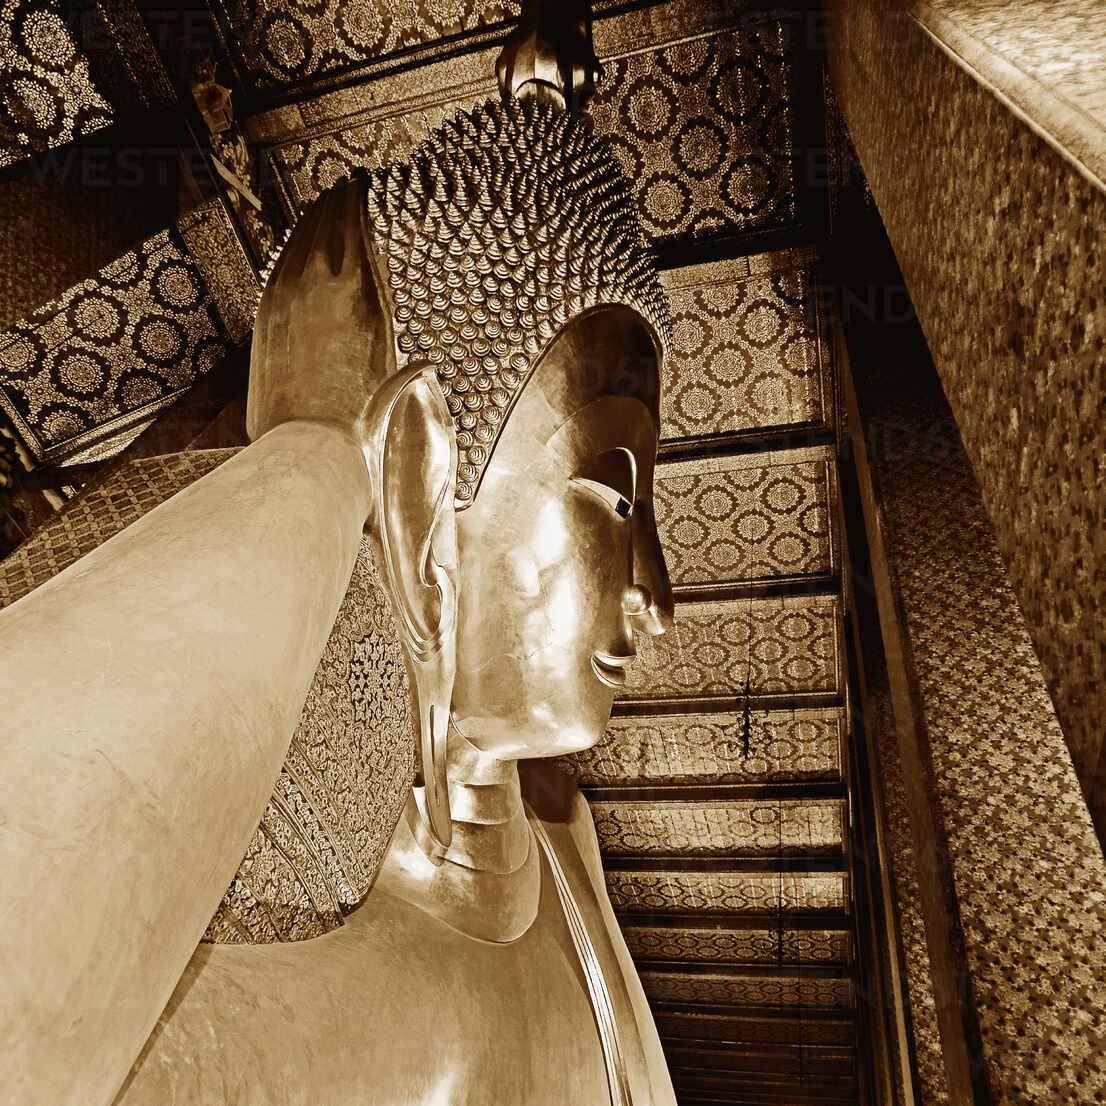 Reclining Buddha Statue – Stockphoto